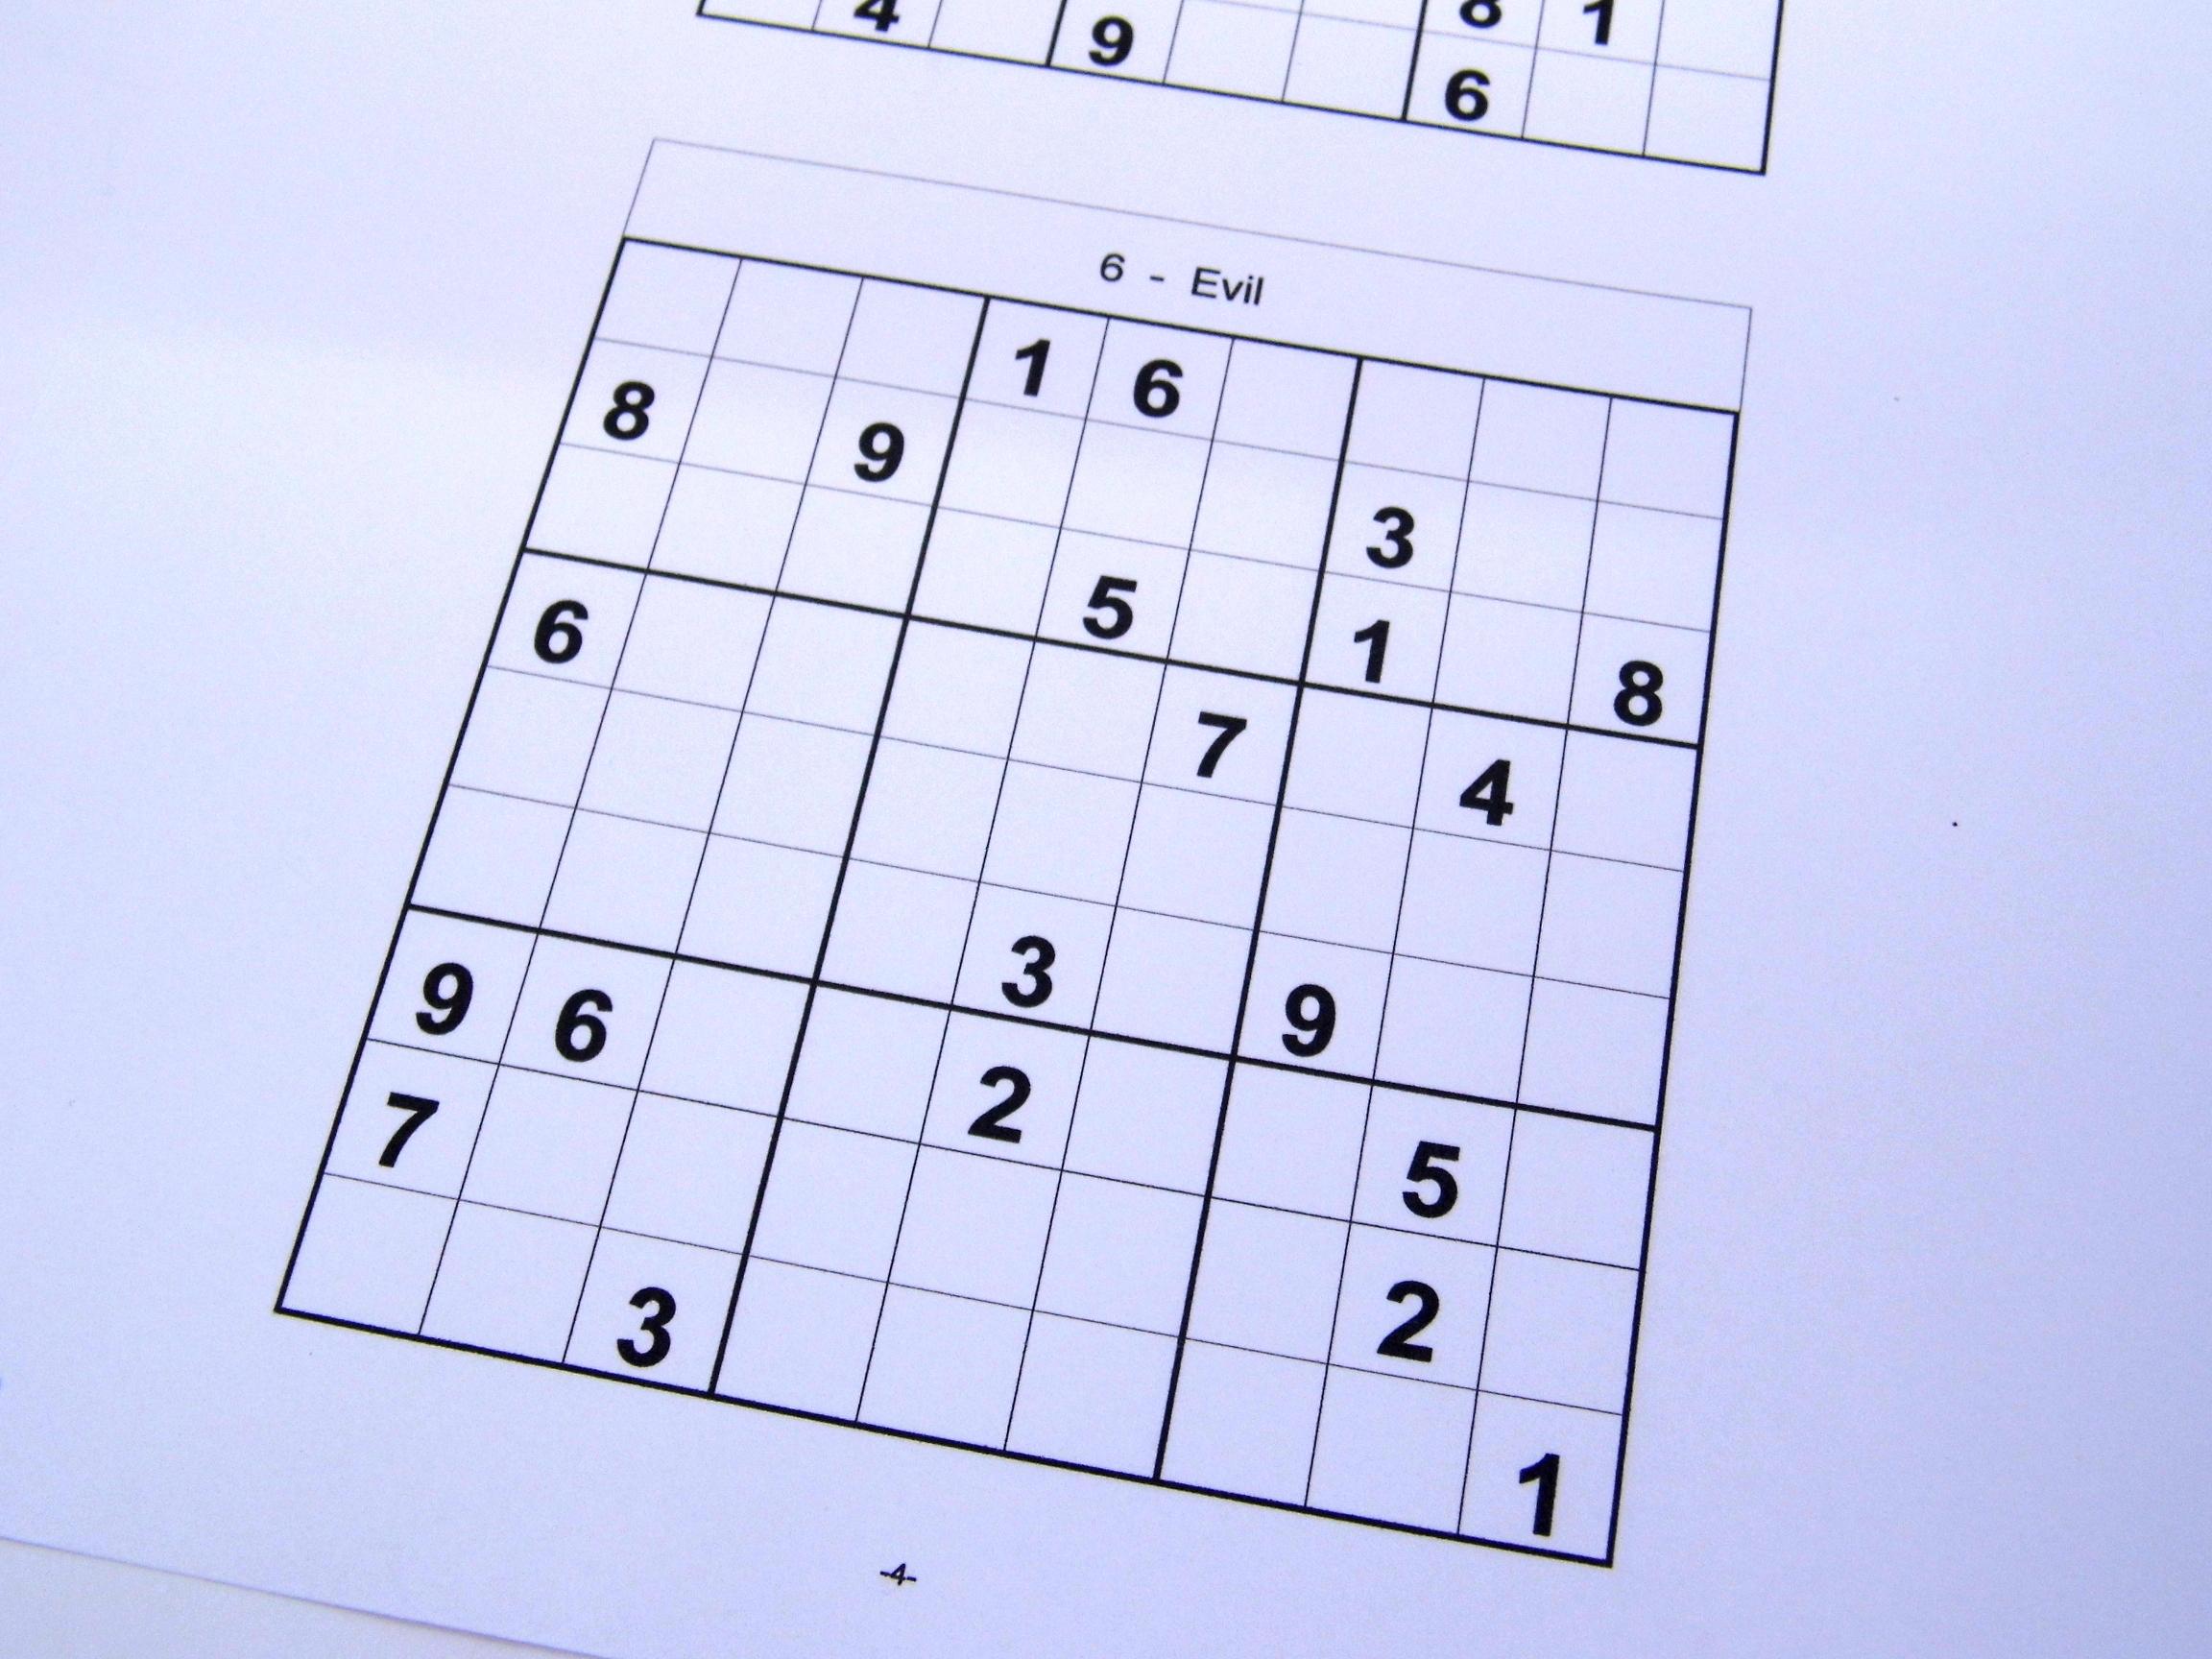 Free Sudoku Puzzles – Free Sudoku Puzzles From Easy To Evil Level - Free Printable Sudoku Books